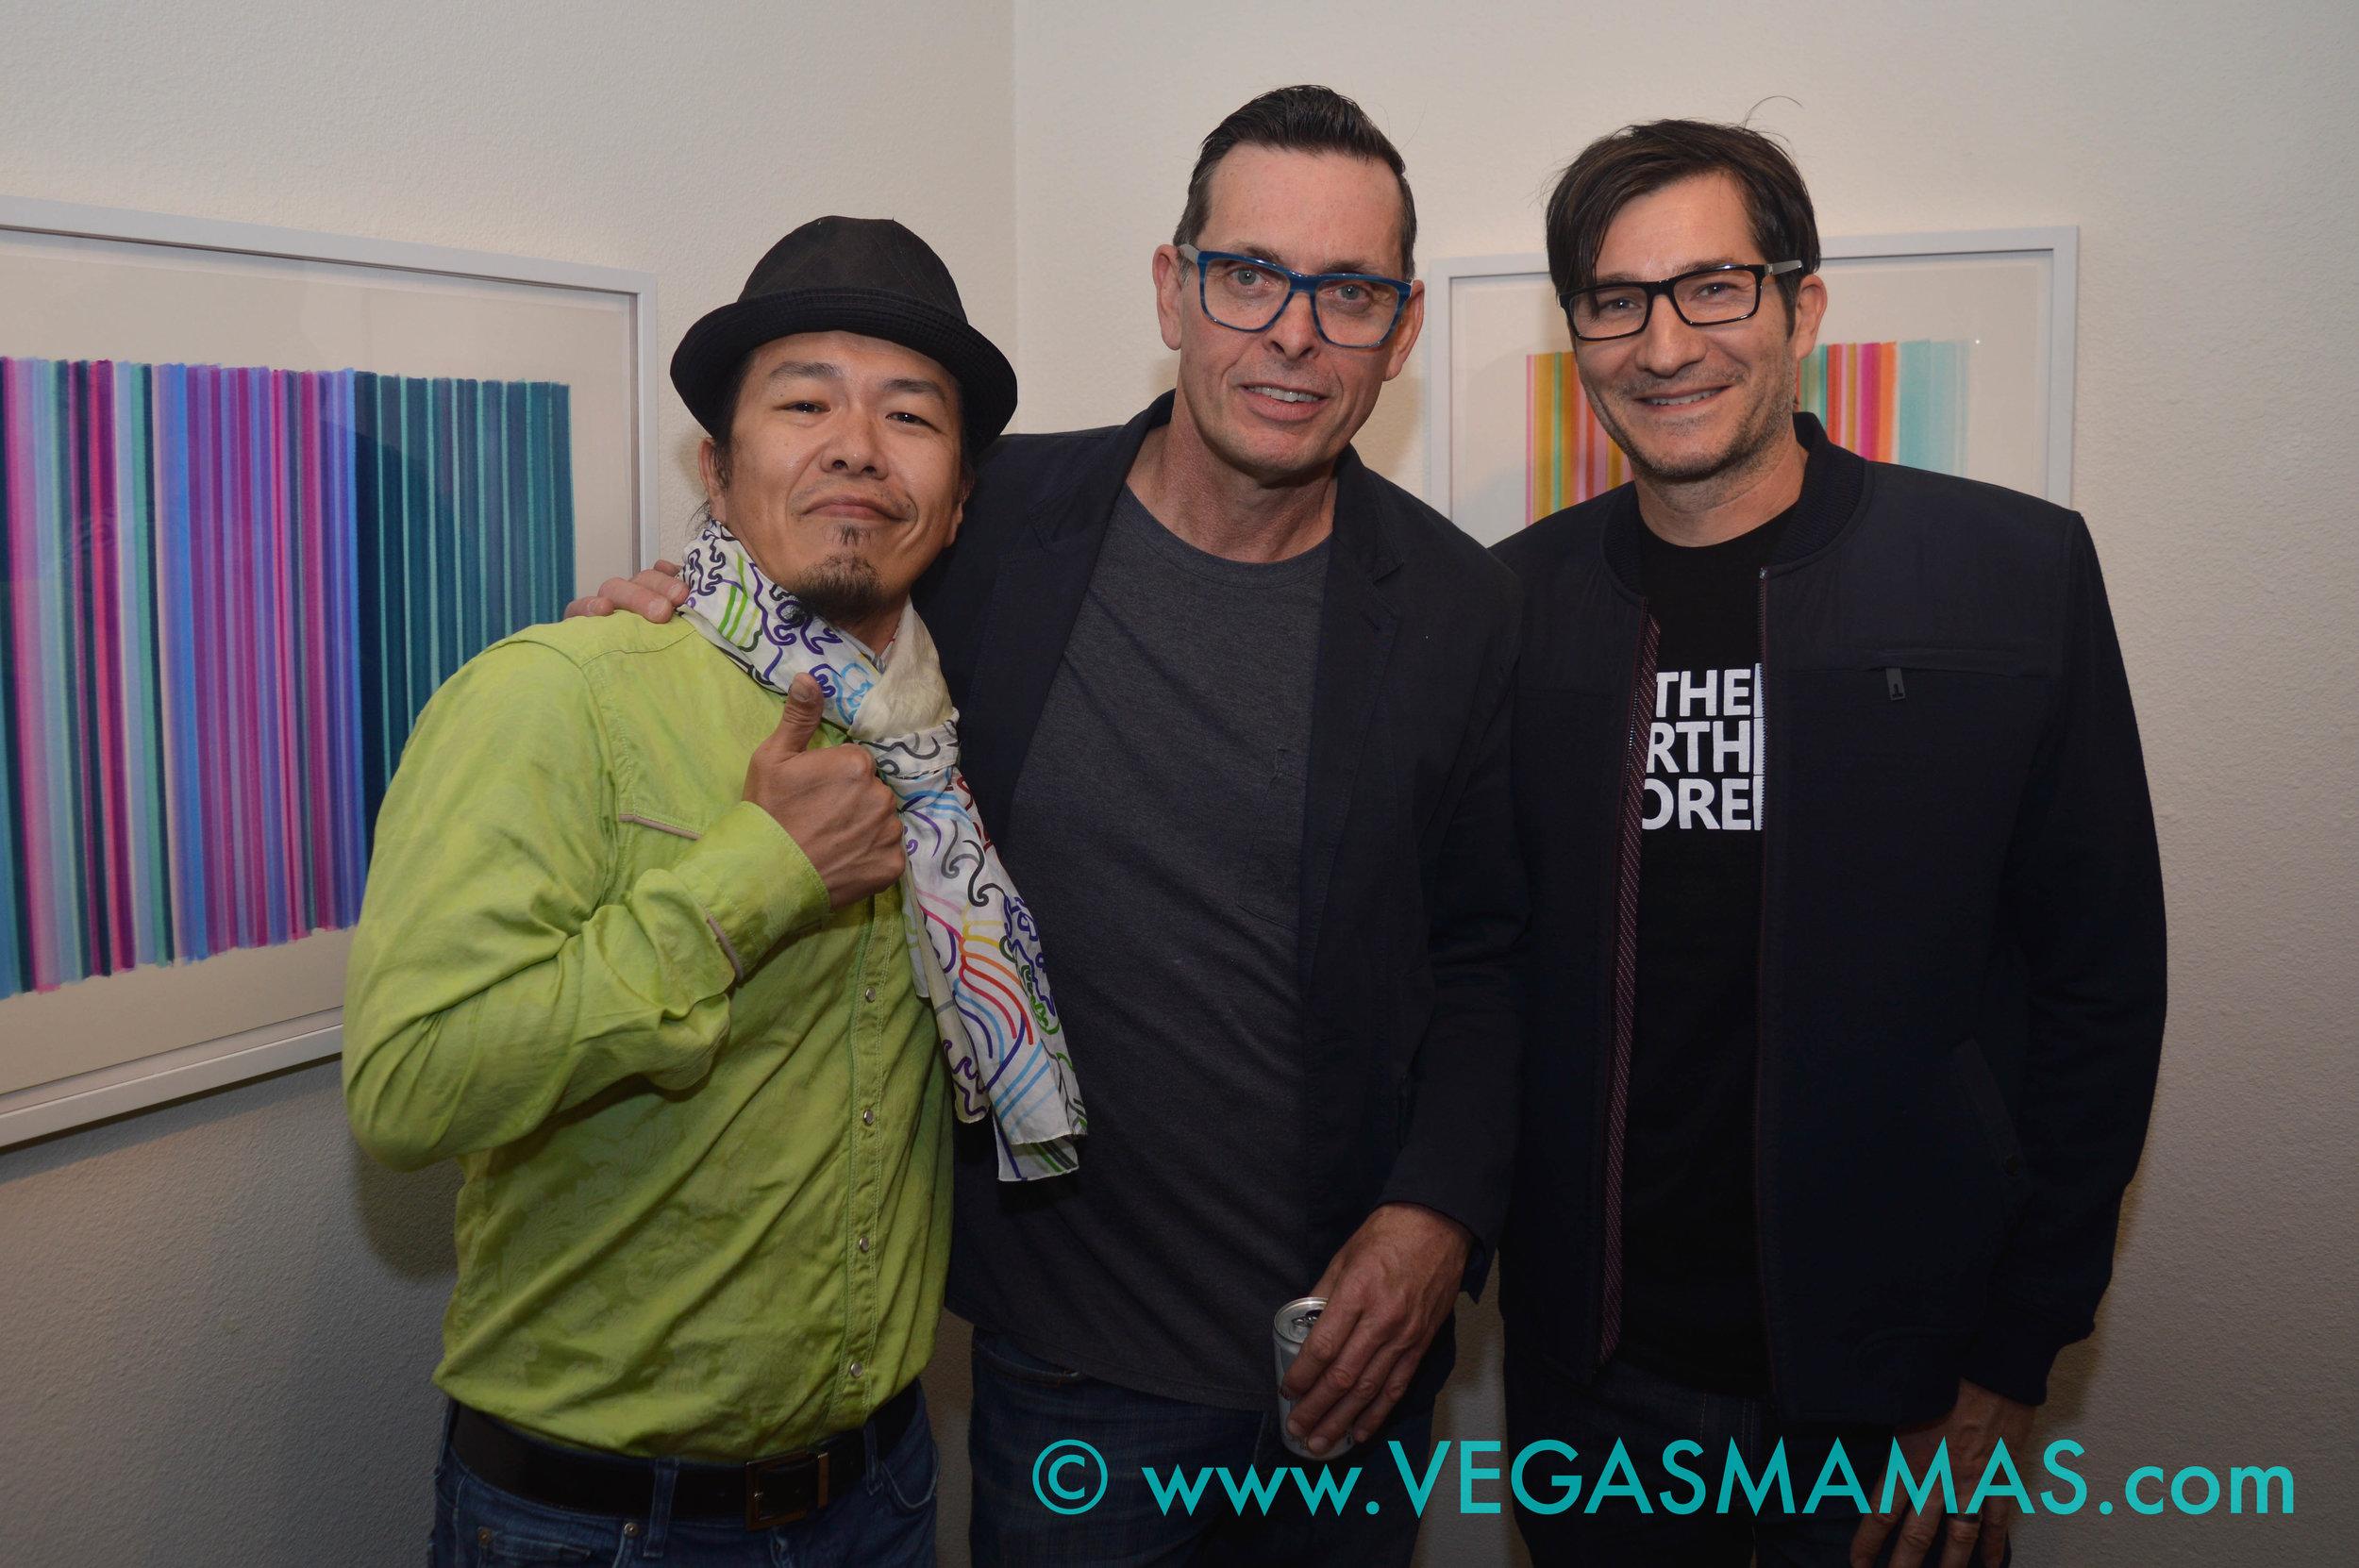 Sush Machida, Tim Bavington and David Ryan